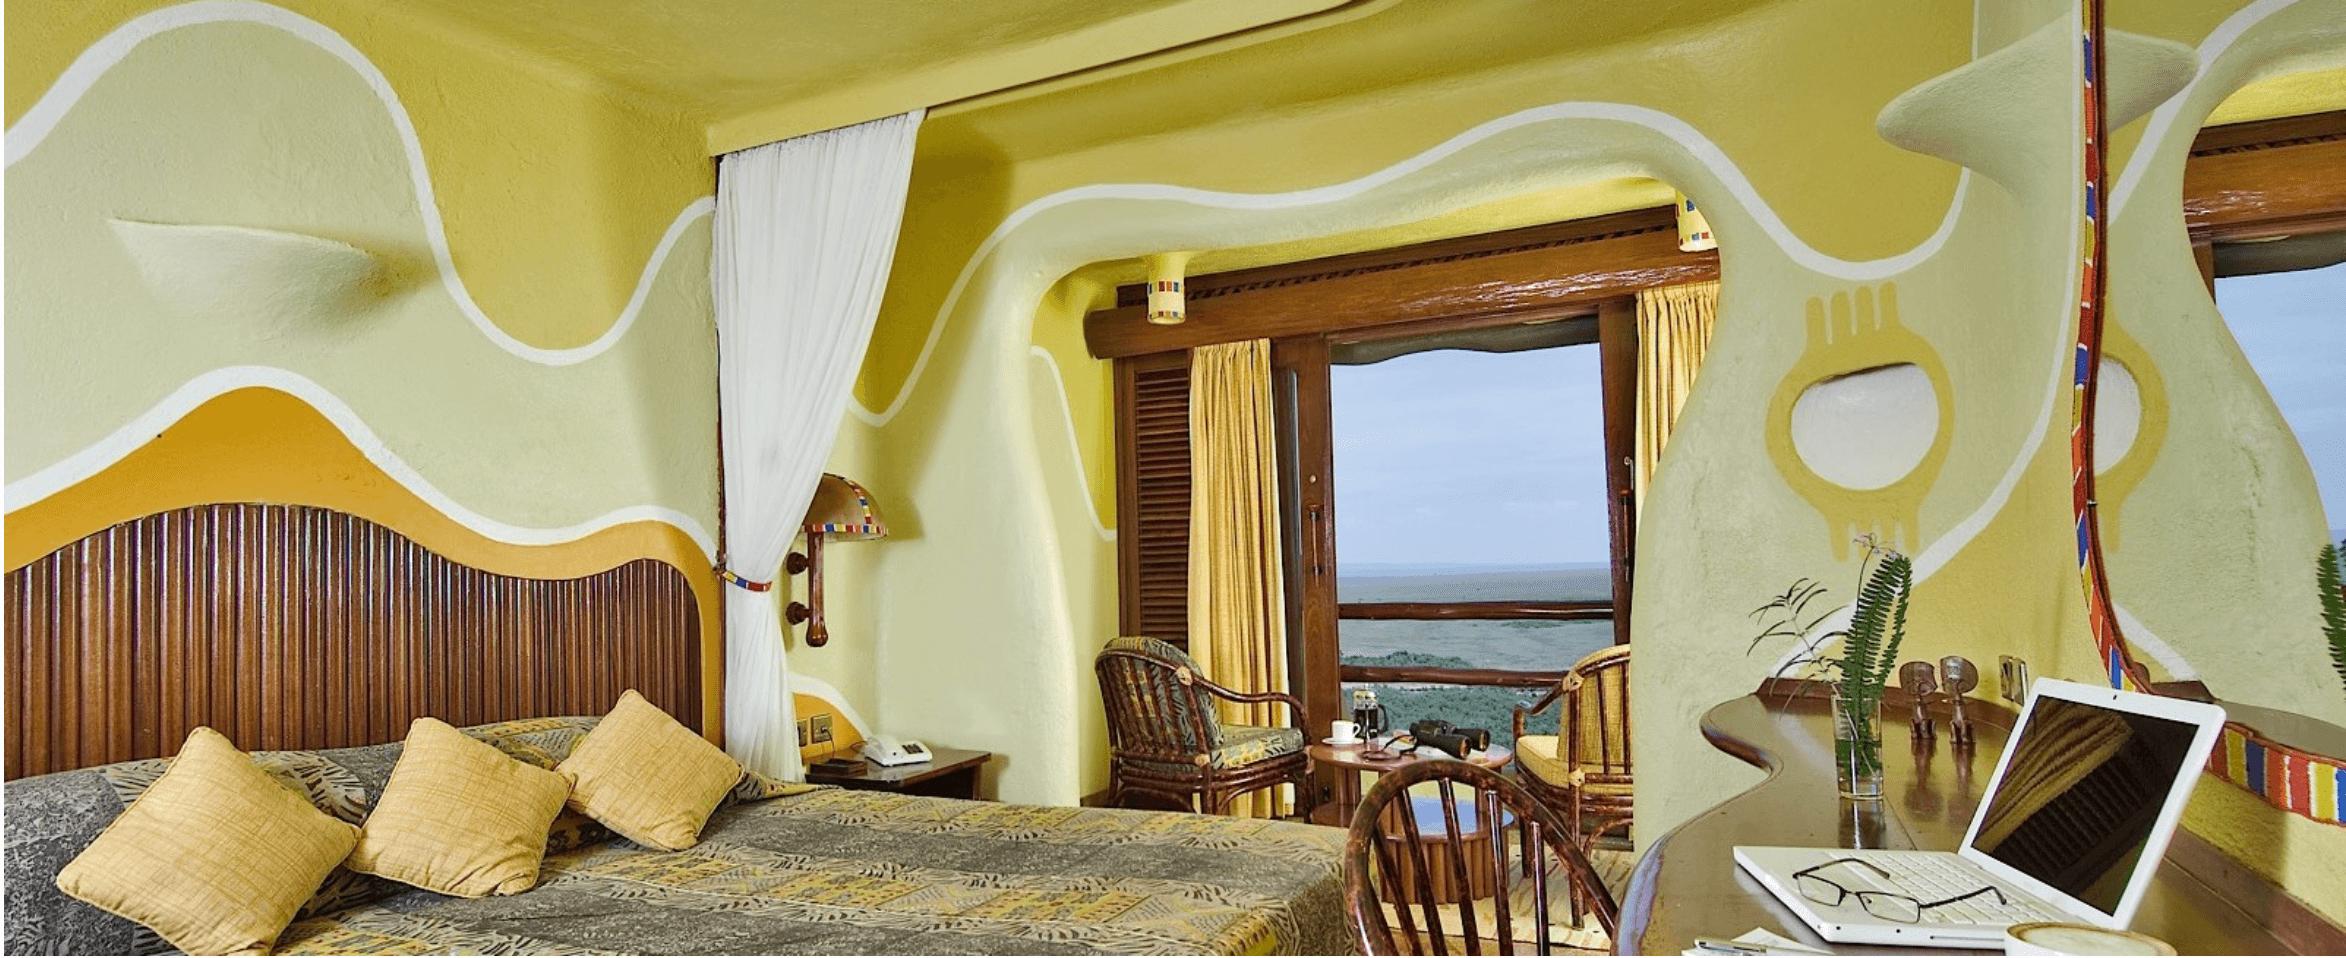 Sarena Mara Safari Lodge